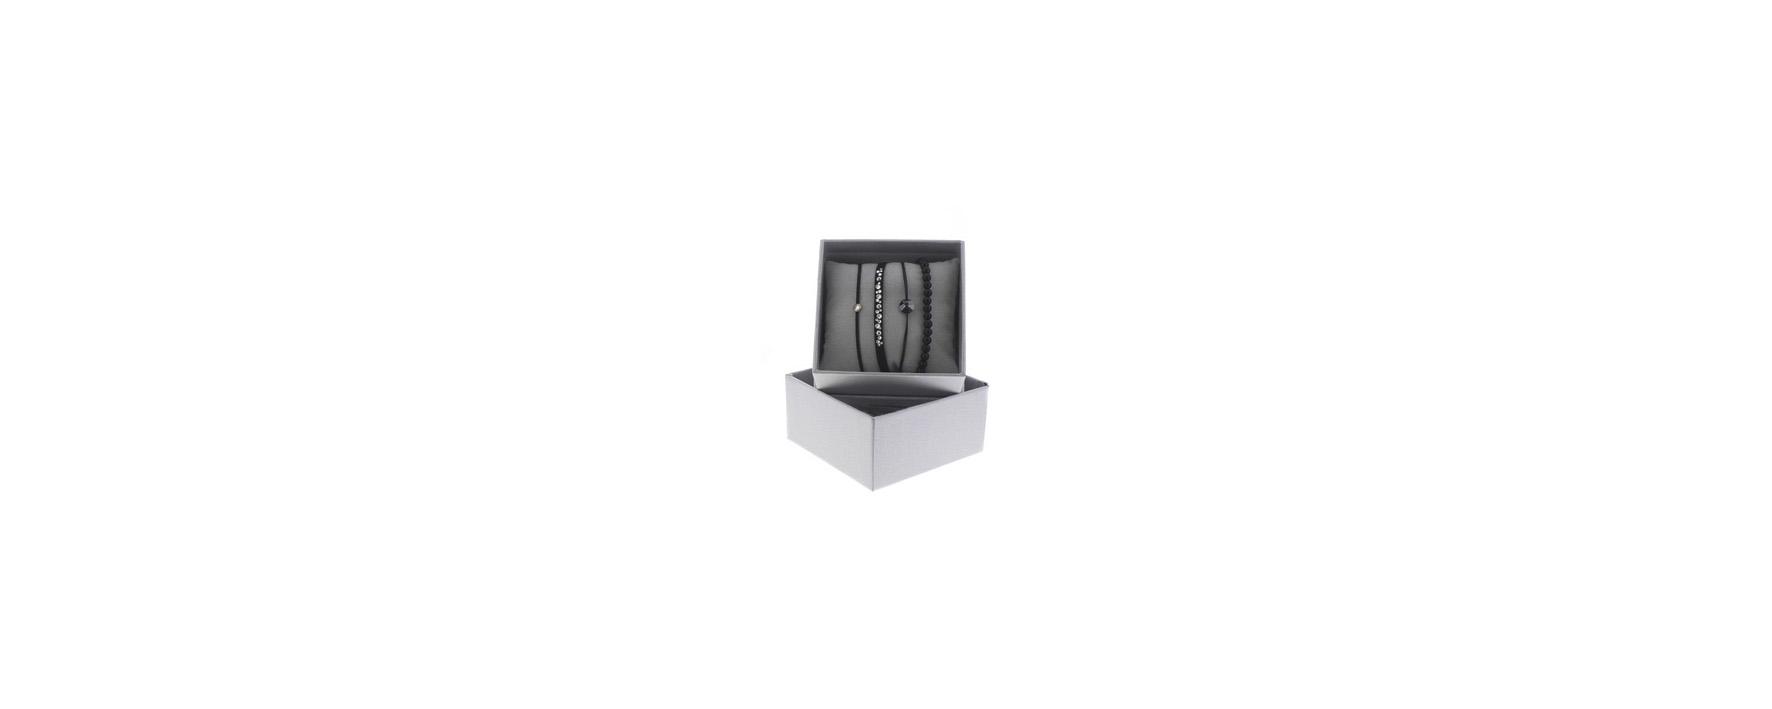 strass-box-collector-2017-2018-cristaux-swarovski--A47072